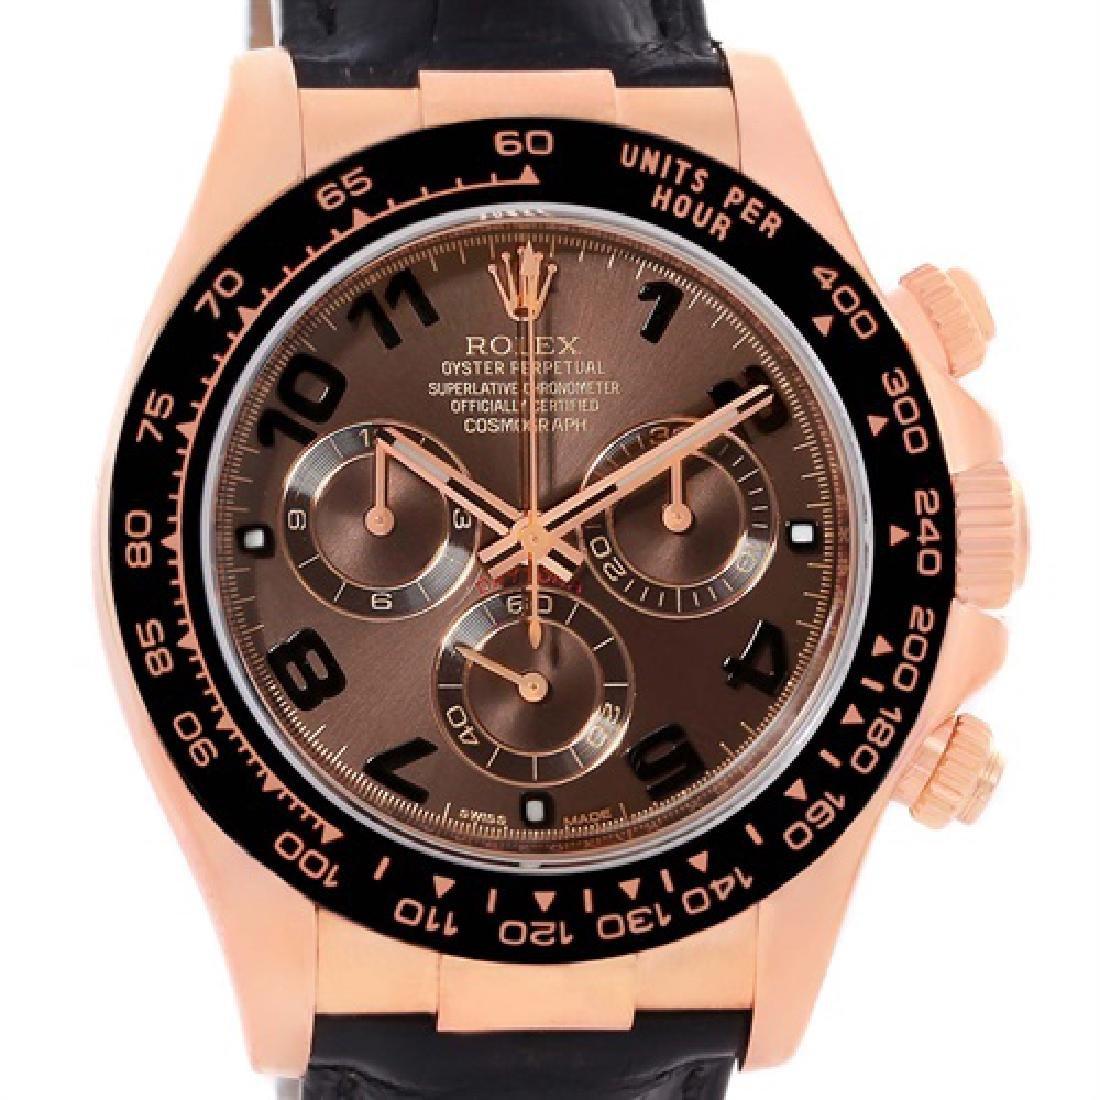 Rolex Cosmograph Daytona 18K Rose Gold Everose Watch